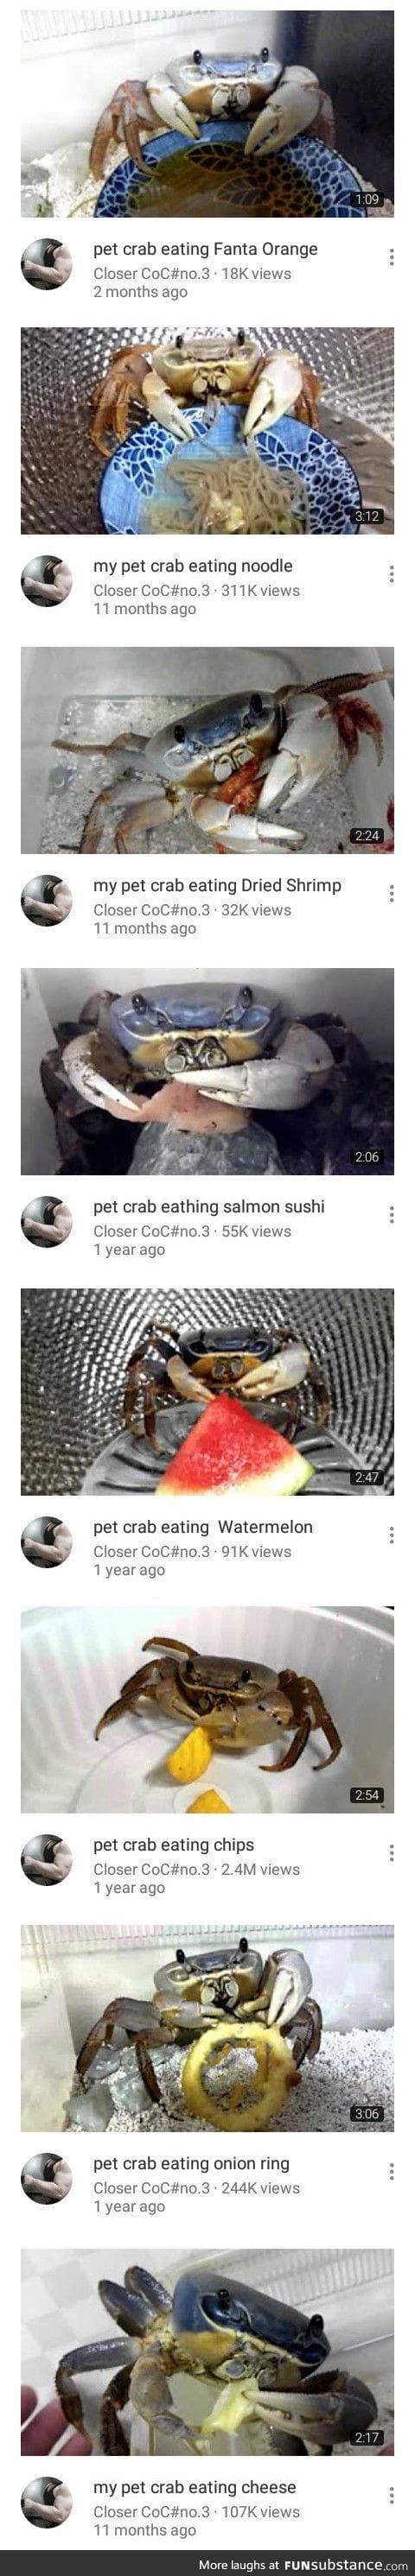 Crab eating stuff